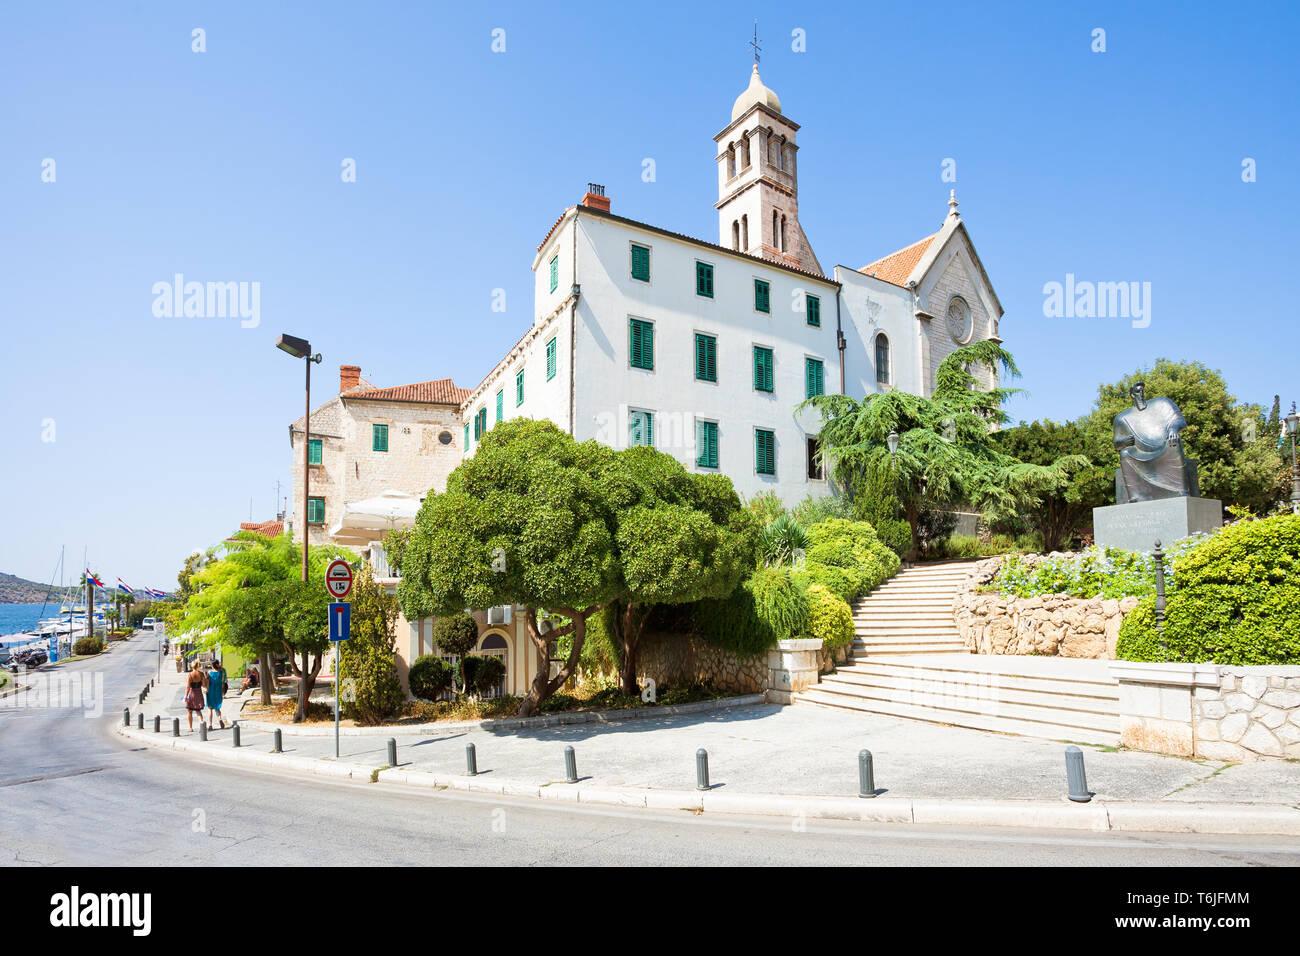 Sibenik, Kroatien, Europa - hinunter zu der Promenade von Sibenik Stockfoto